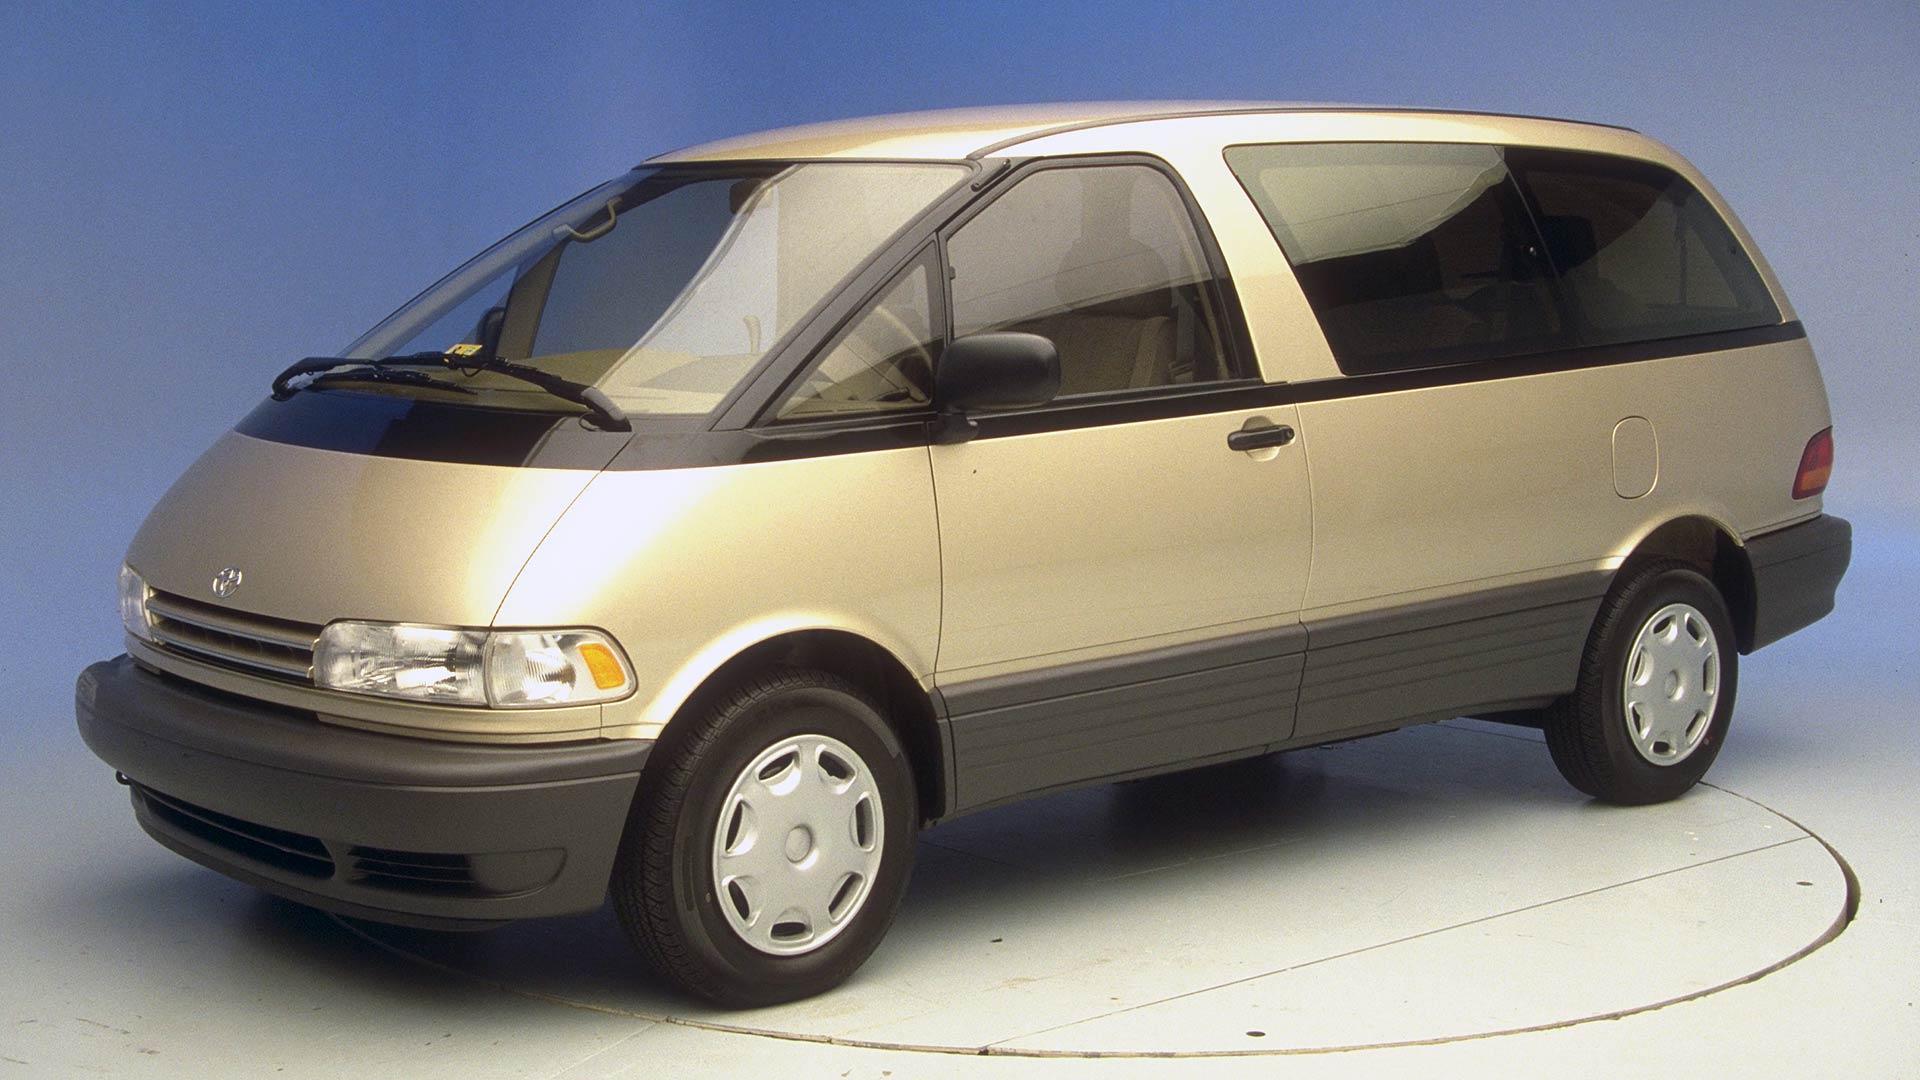 2005 Toyota Rav4 For Sale >> 1997 Toyota Previa